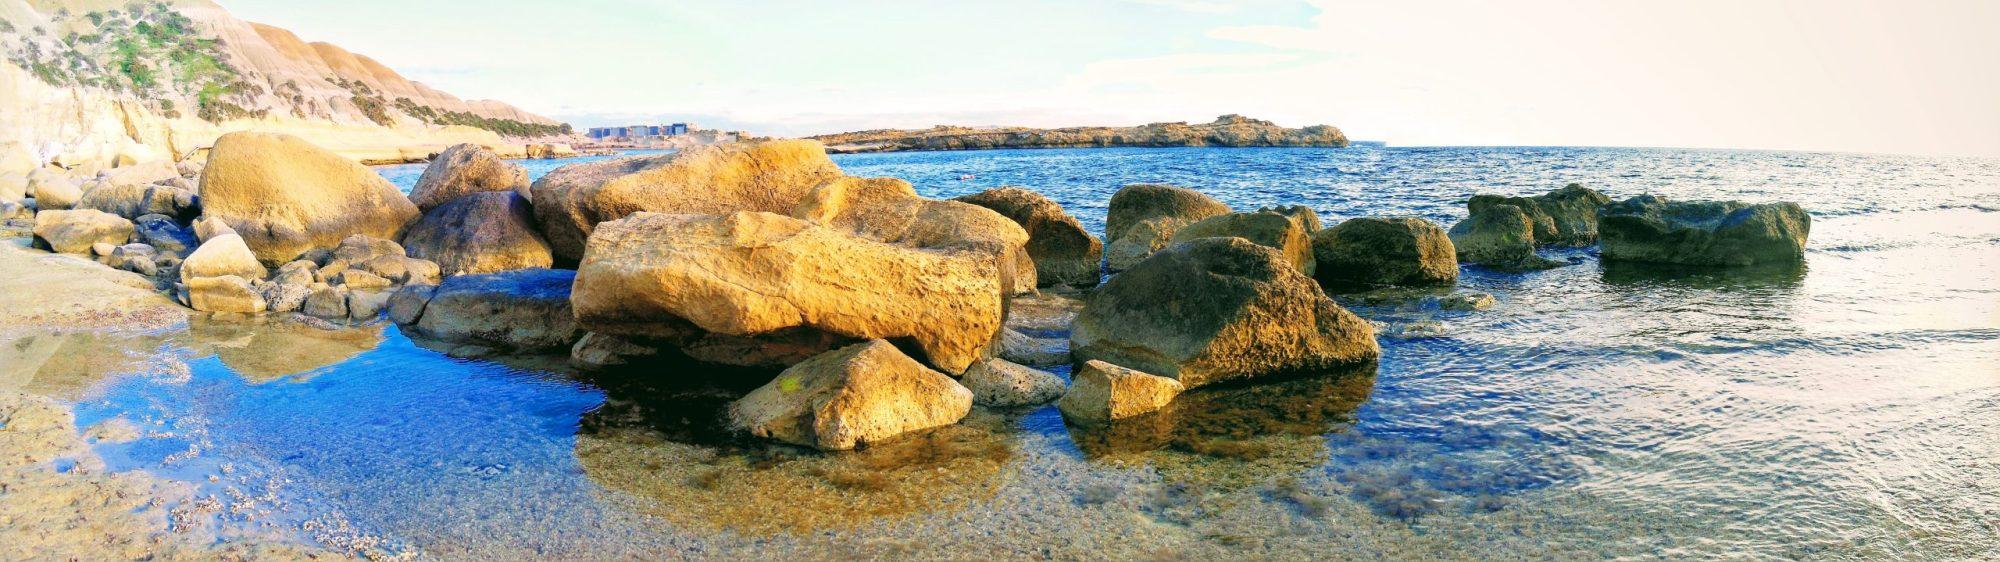 Gozon rantoja Ta' Sannat Mgarr ix-Xini Ta' Cenc Cliffs banner